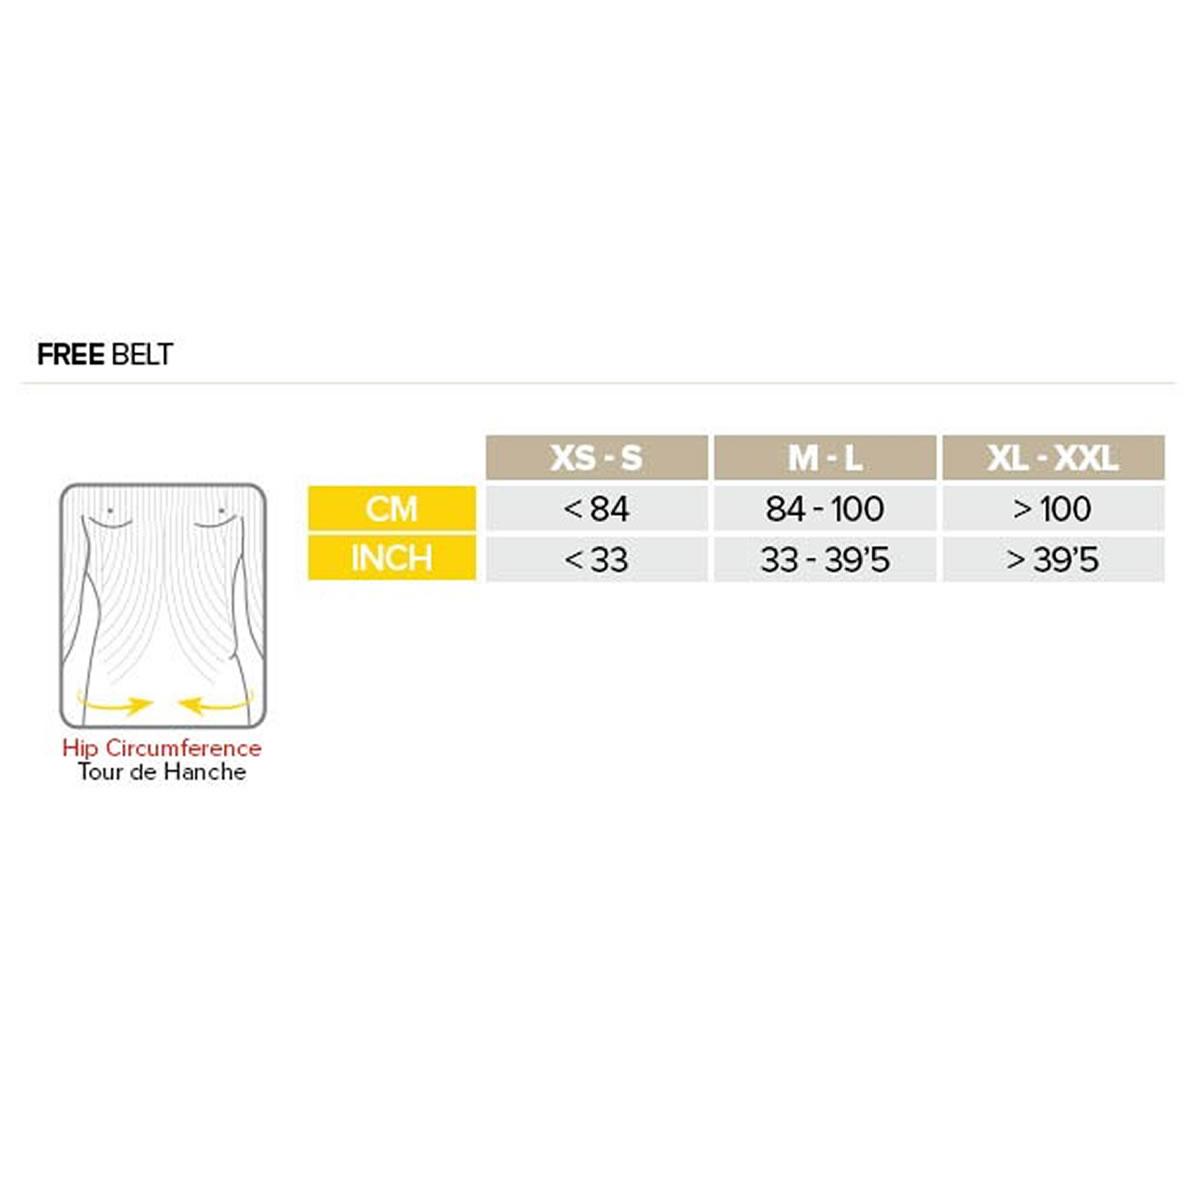 Free Belt seamless unisex - Compressport - 024007062064